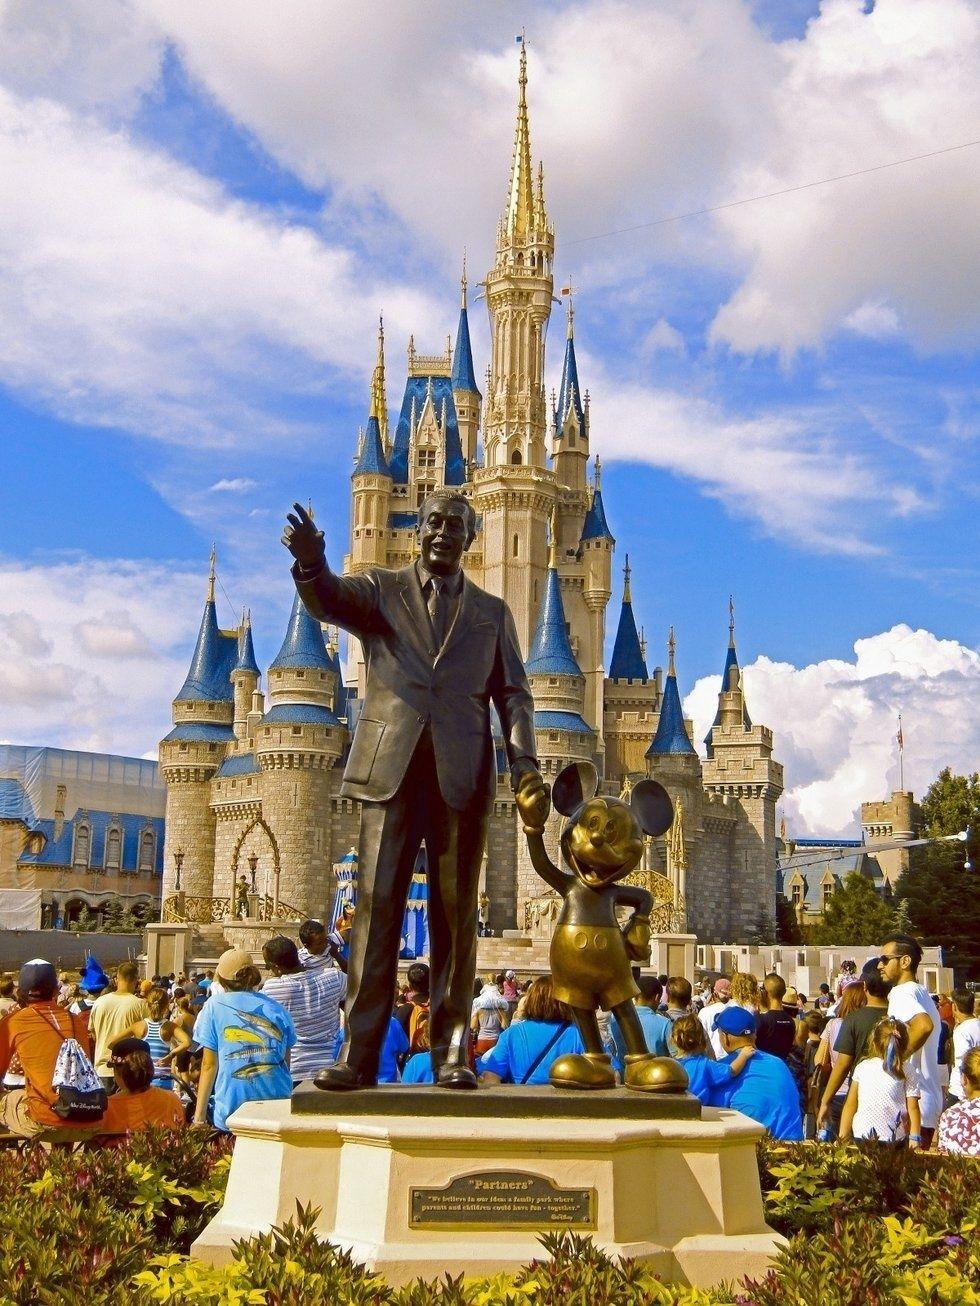 8 Signs You Are A True Disney Park Fan